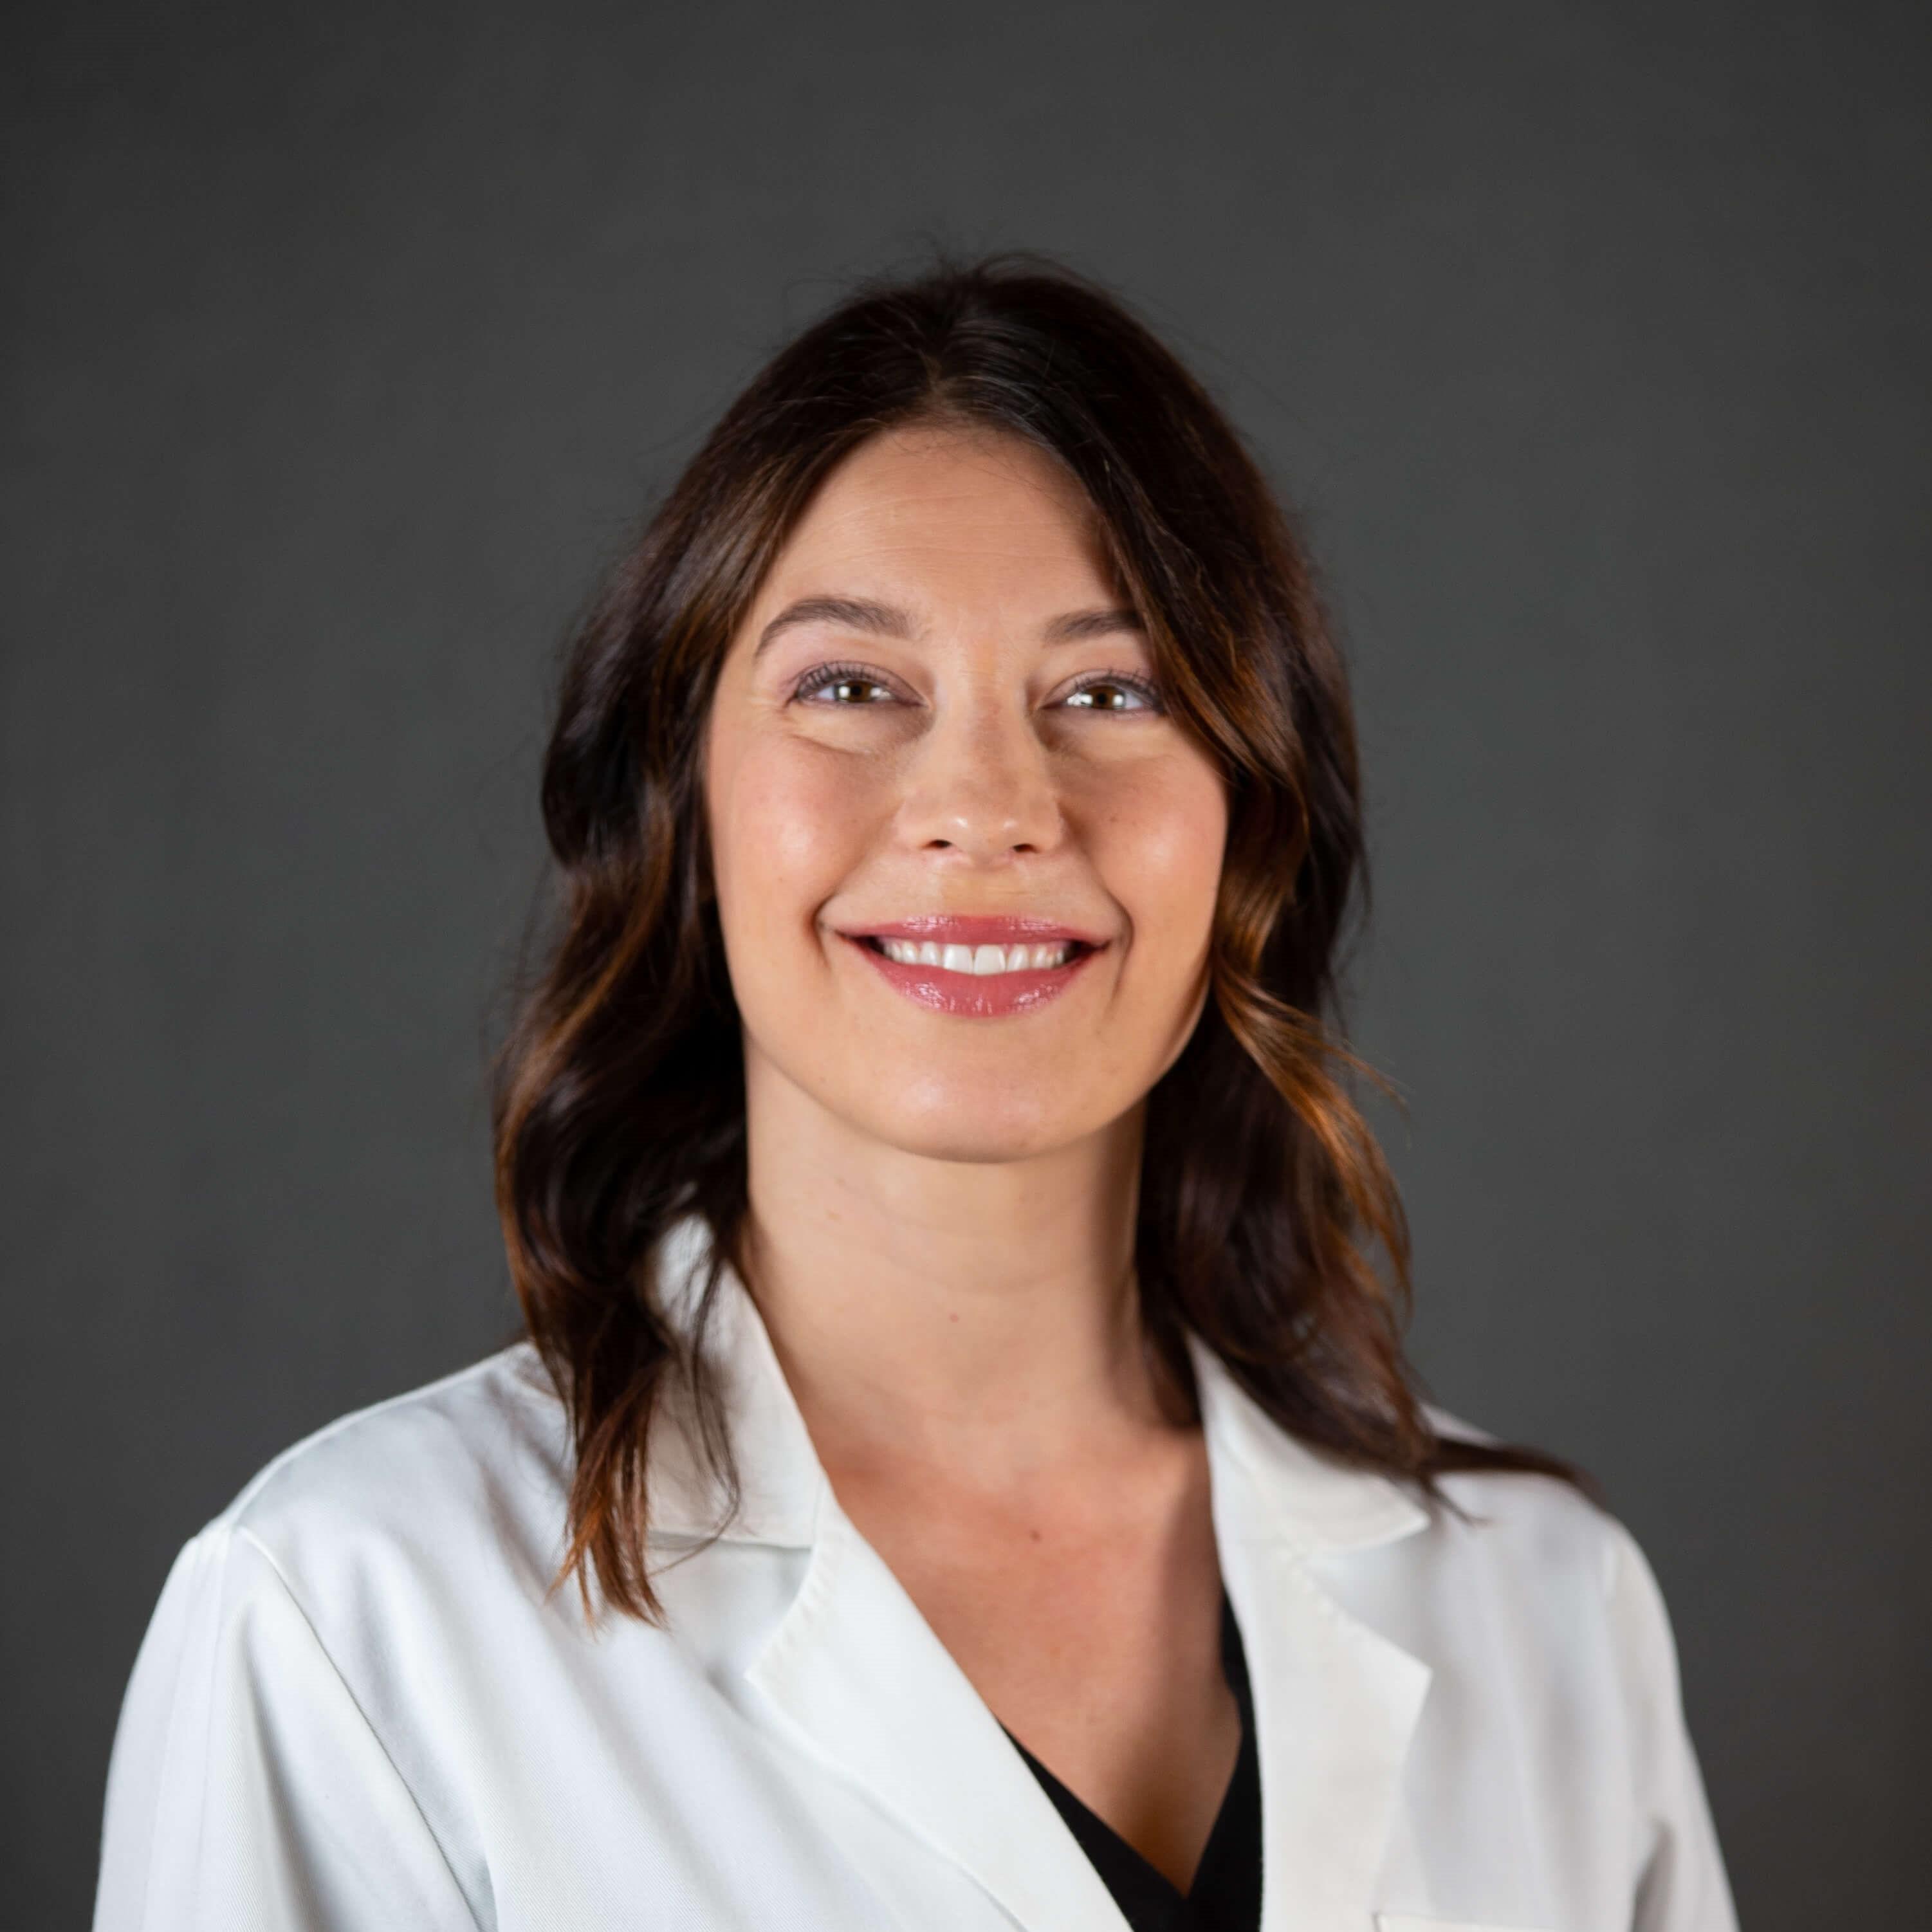 Headshot of Dr. Elizabeth Gubernick